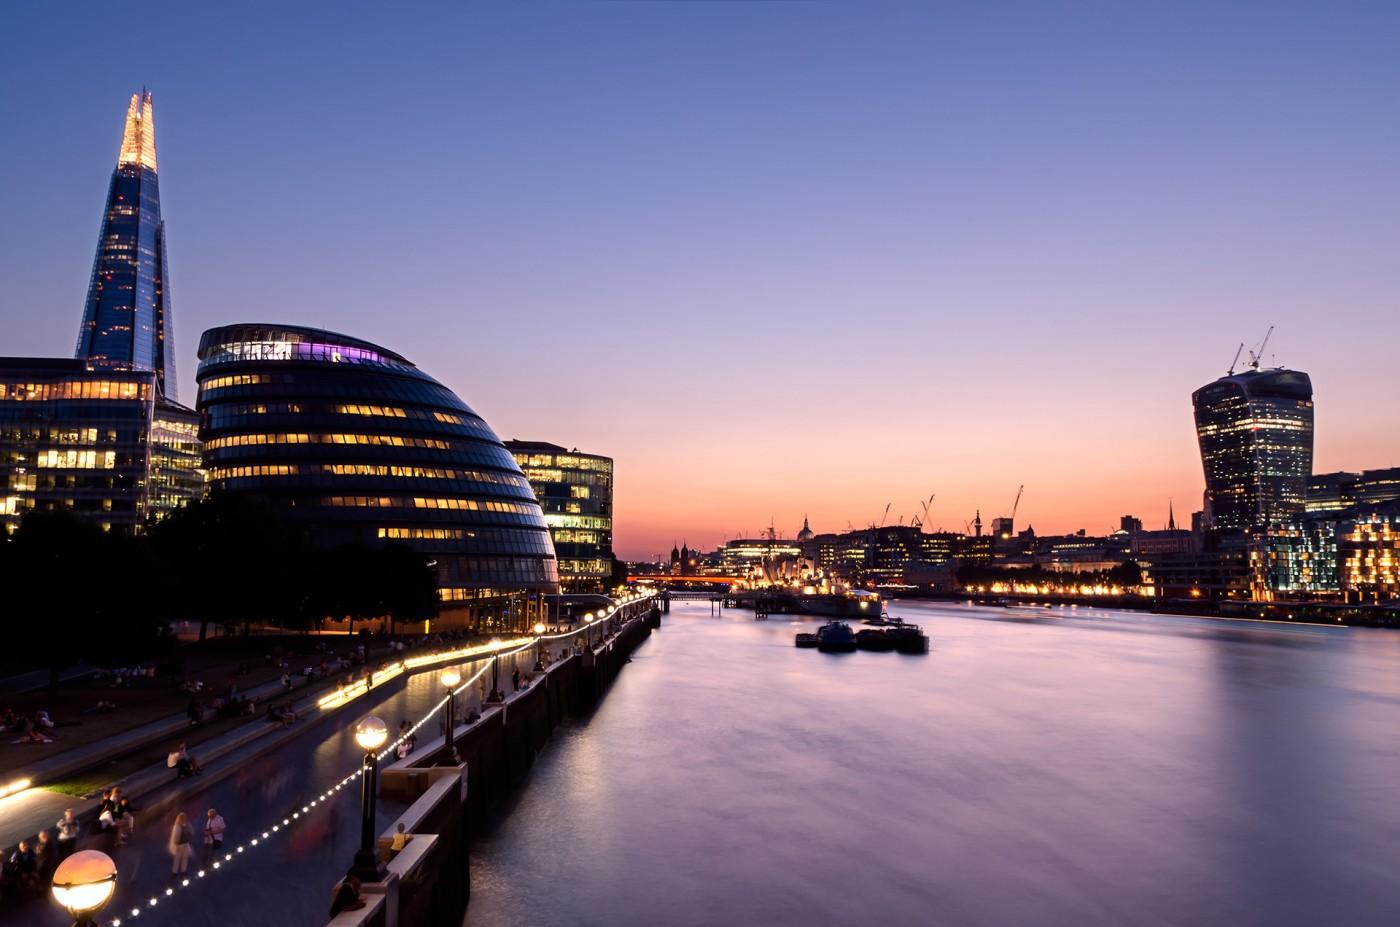 Night at the Thames